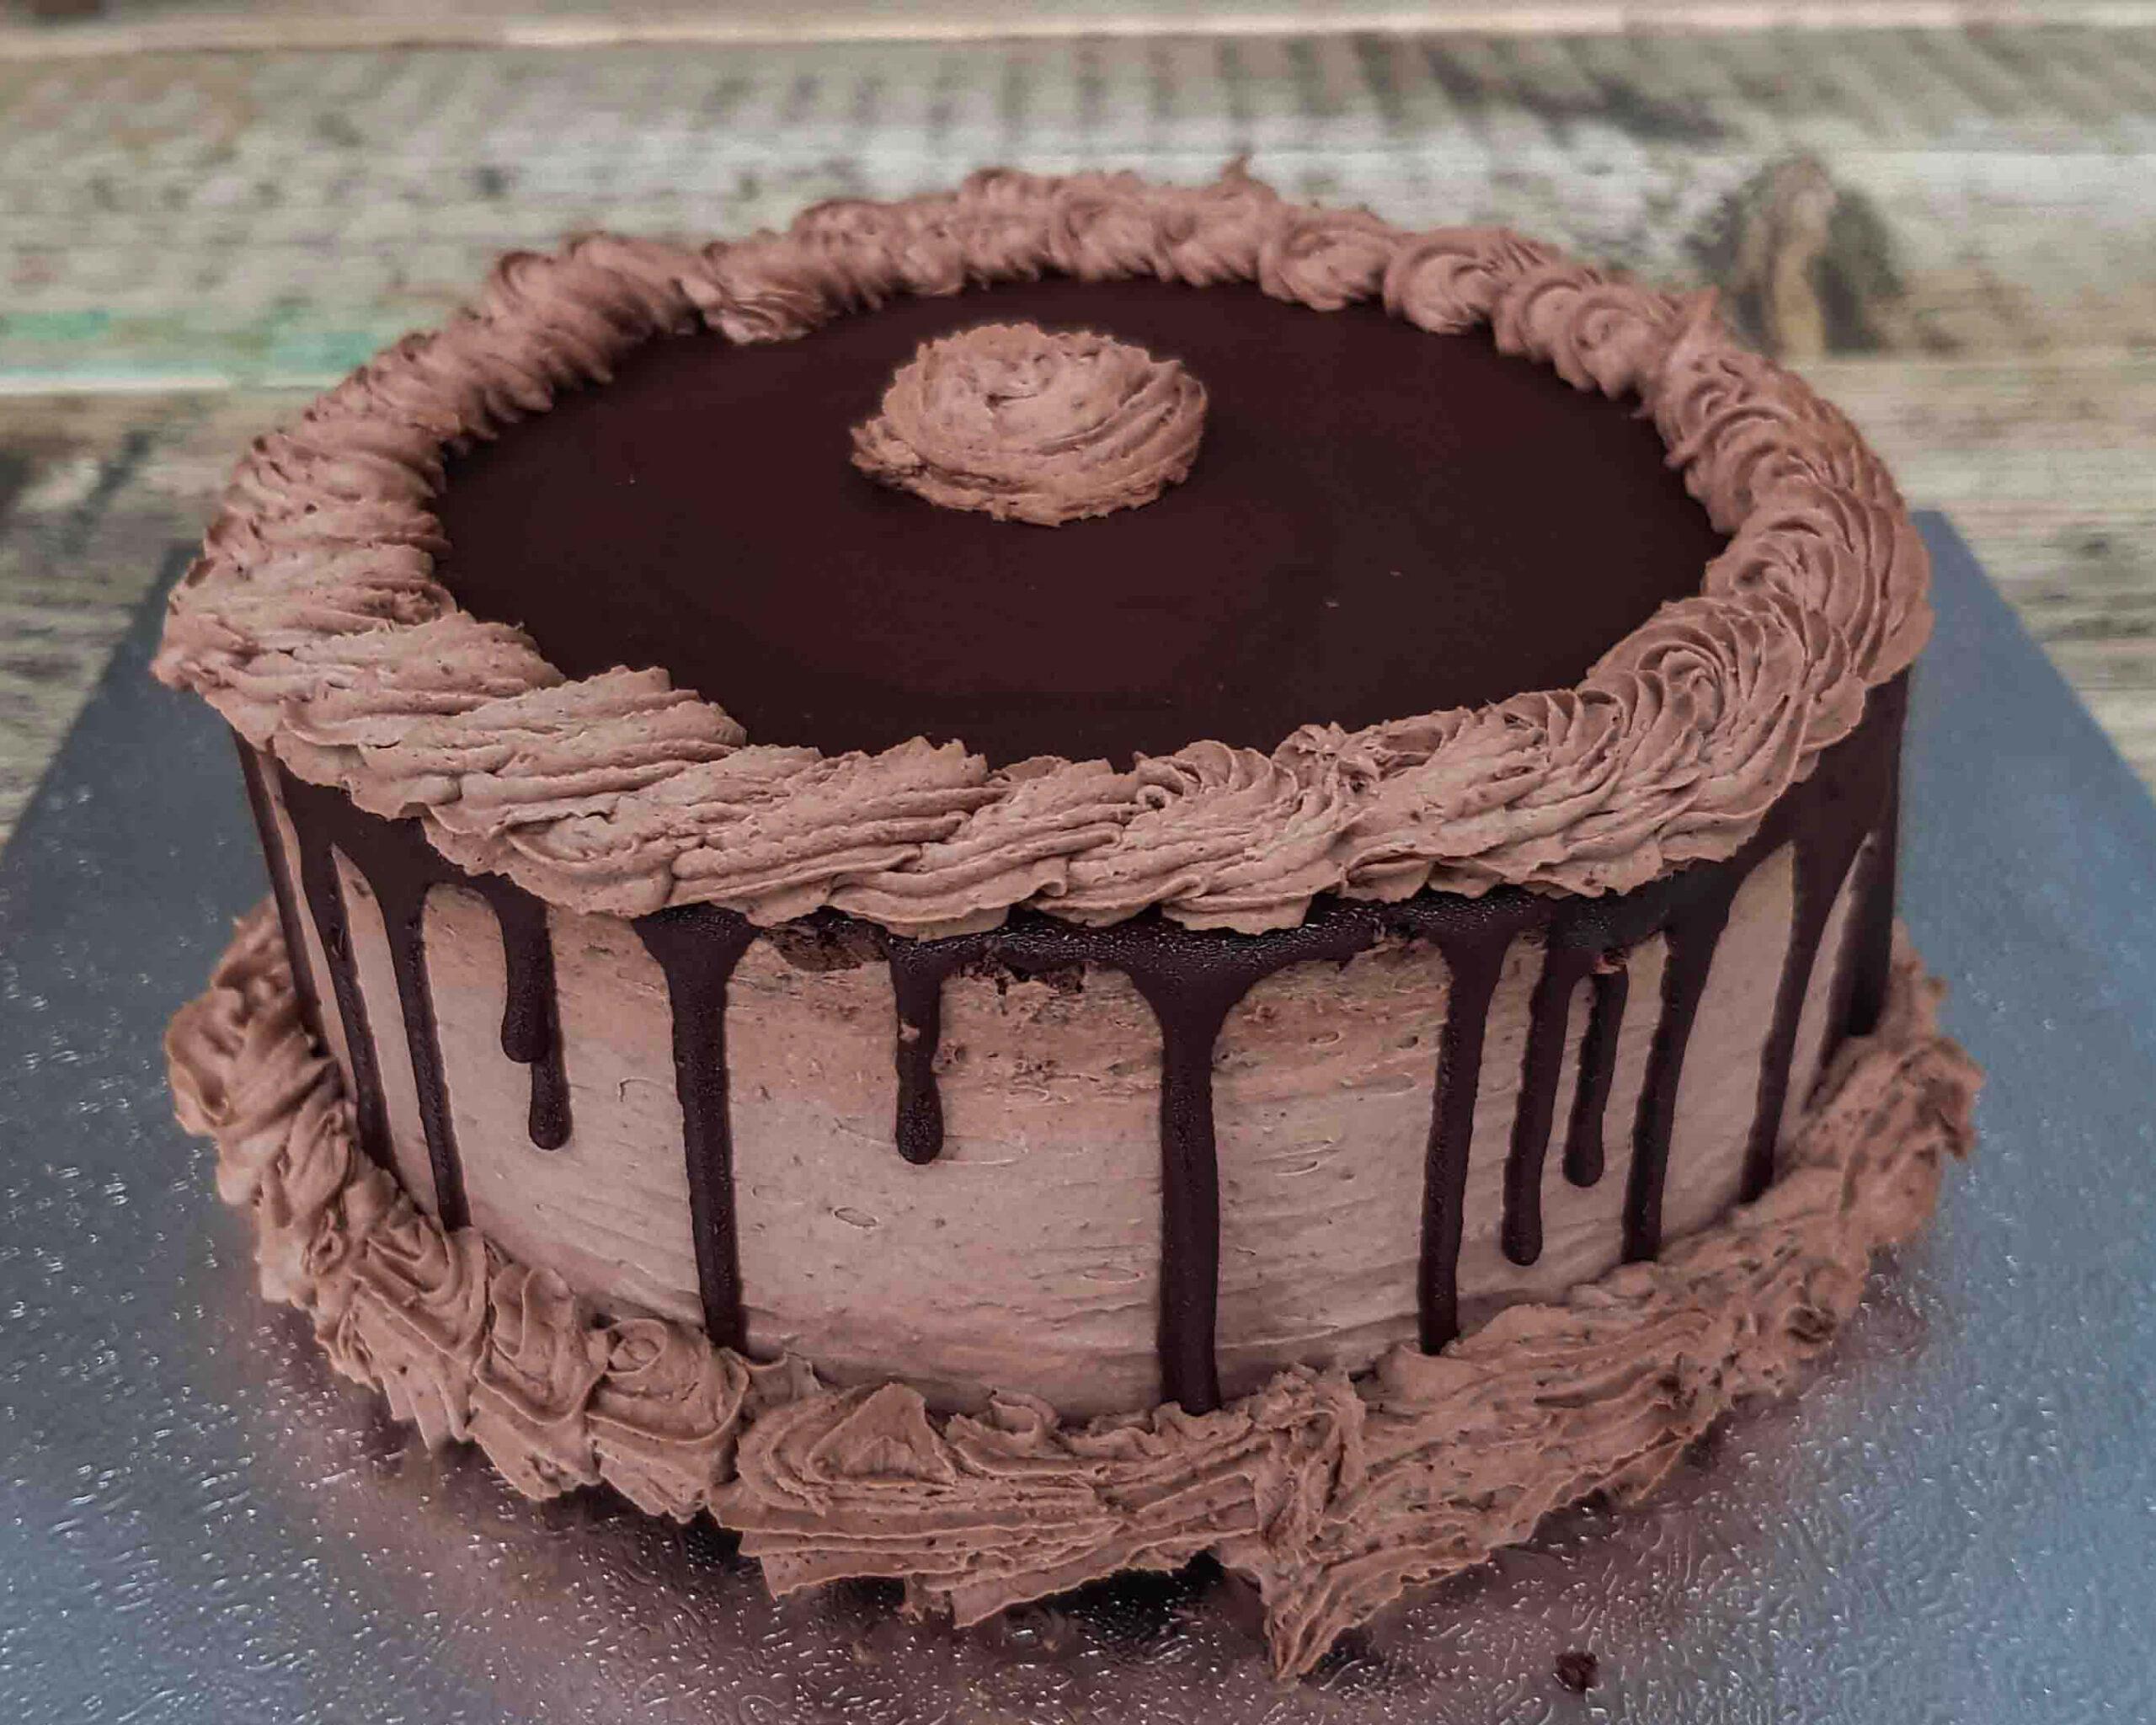 Strawberry cottagecheese cake